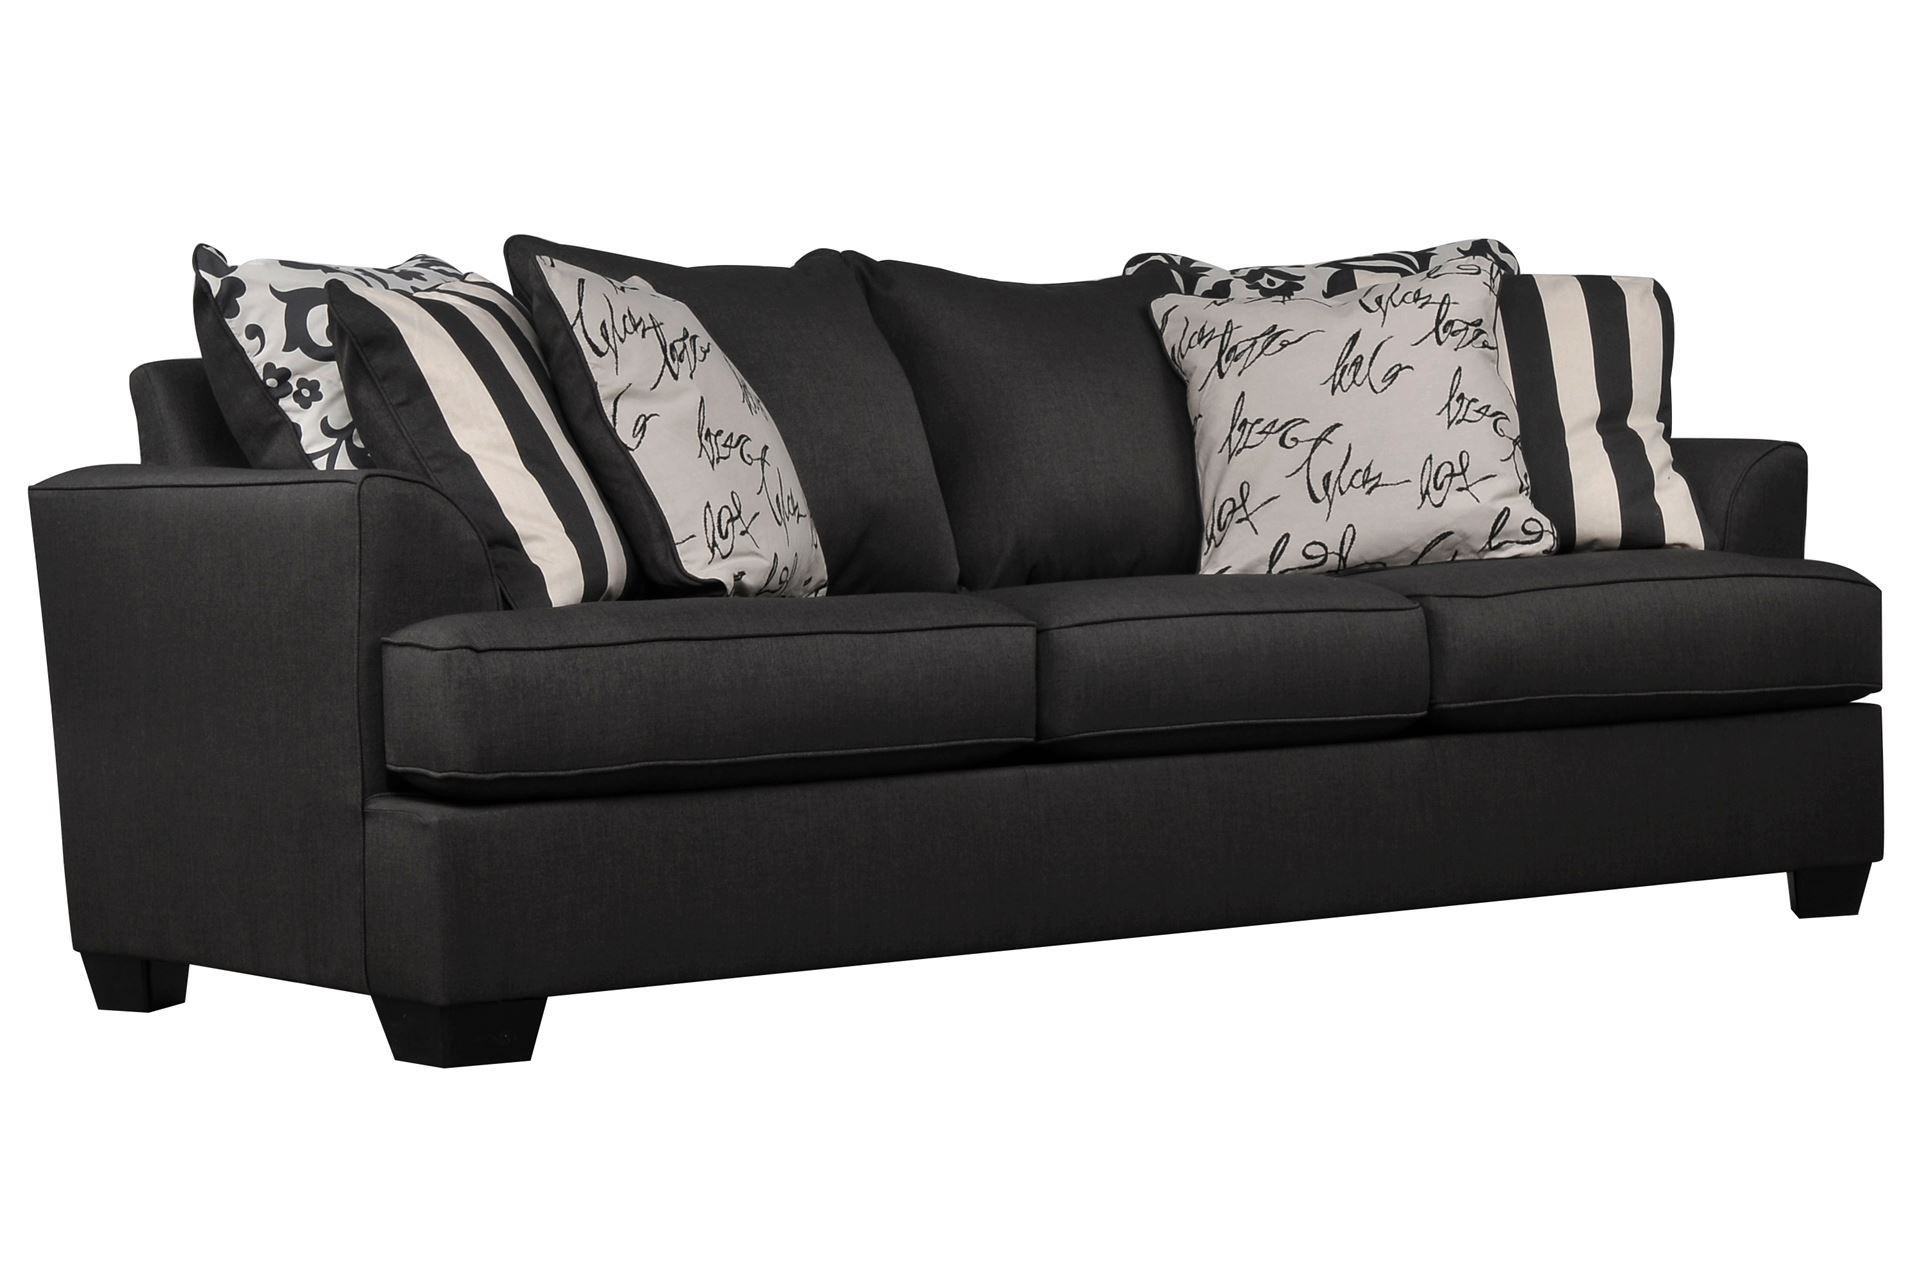 Levon Charcoal Sofa | Charcoal Sofa, Charcoal And Living Spaces